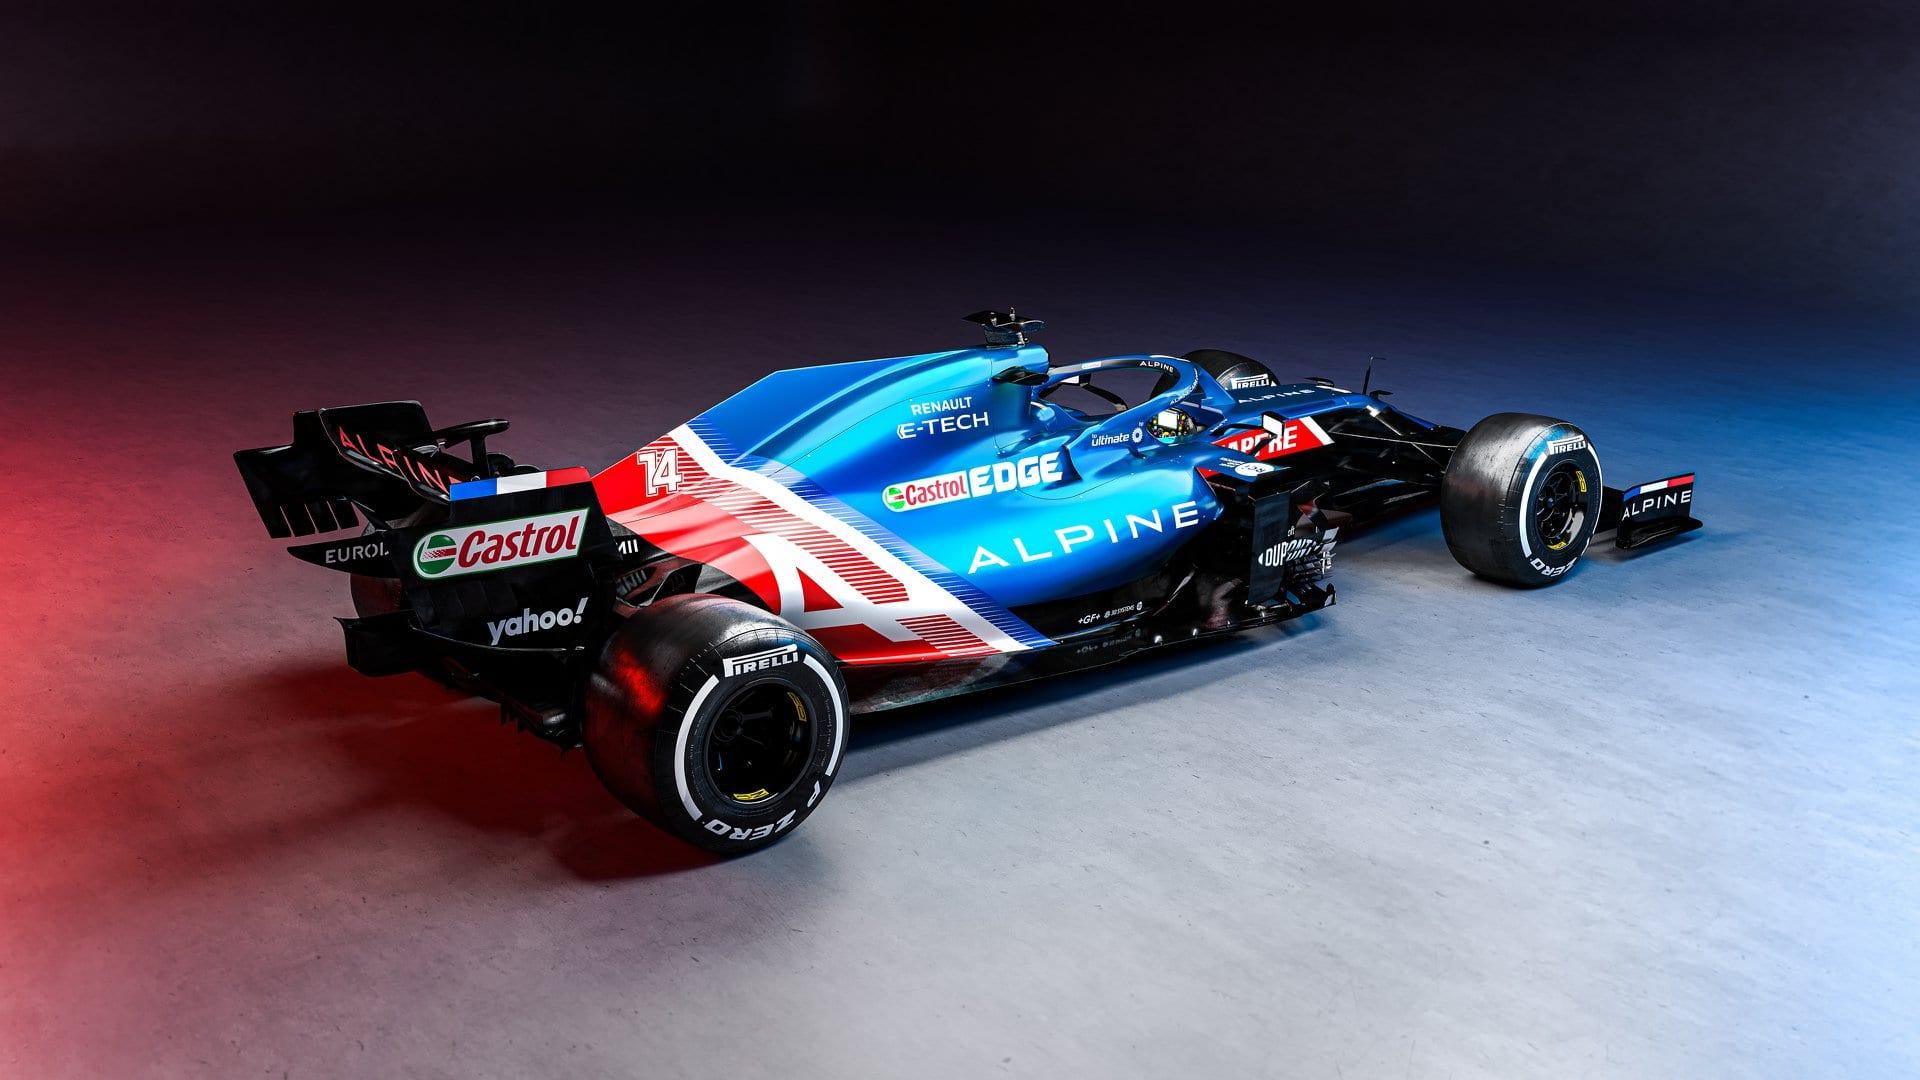 Formula 1 – Η νέα Alpine F1 Team  A521